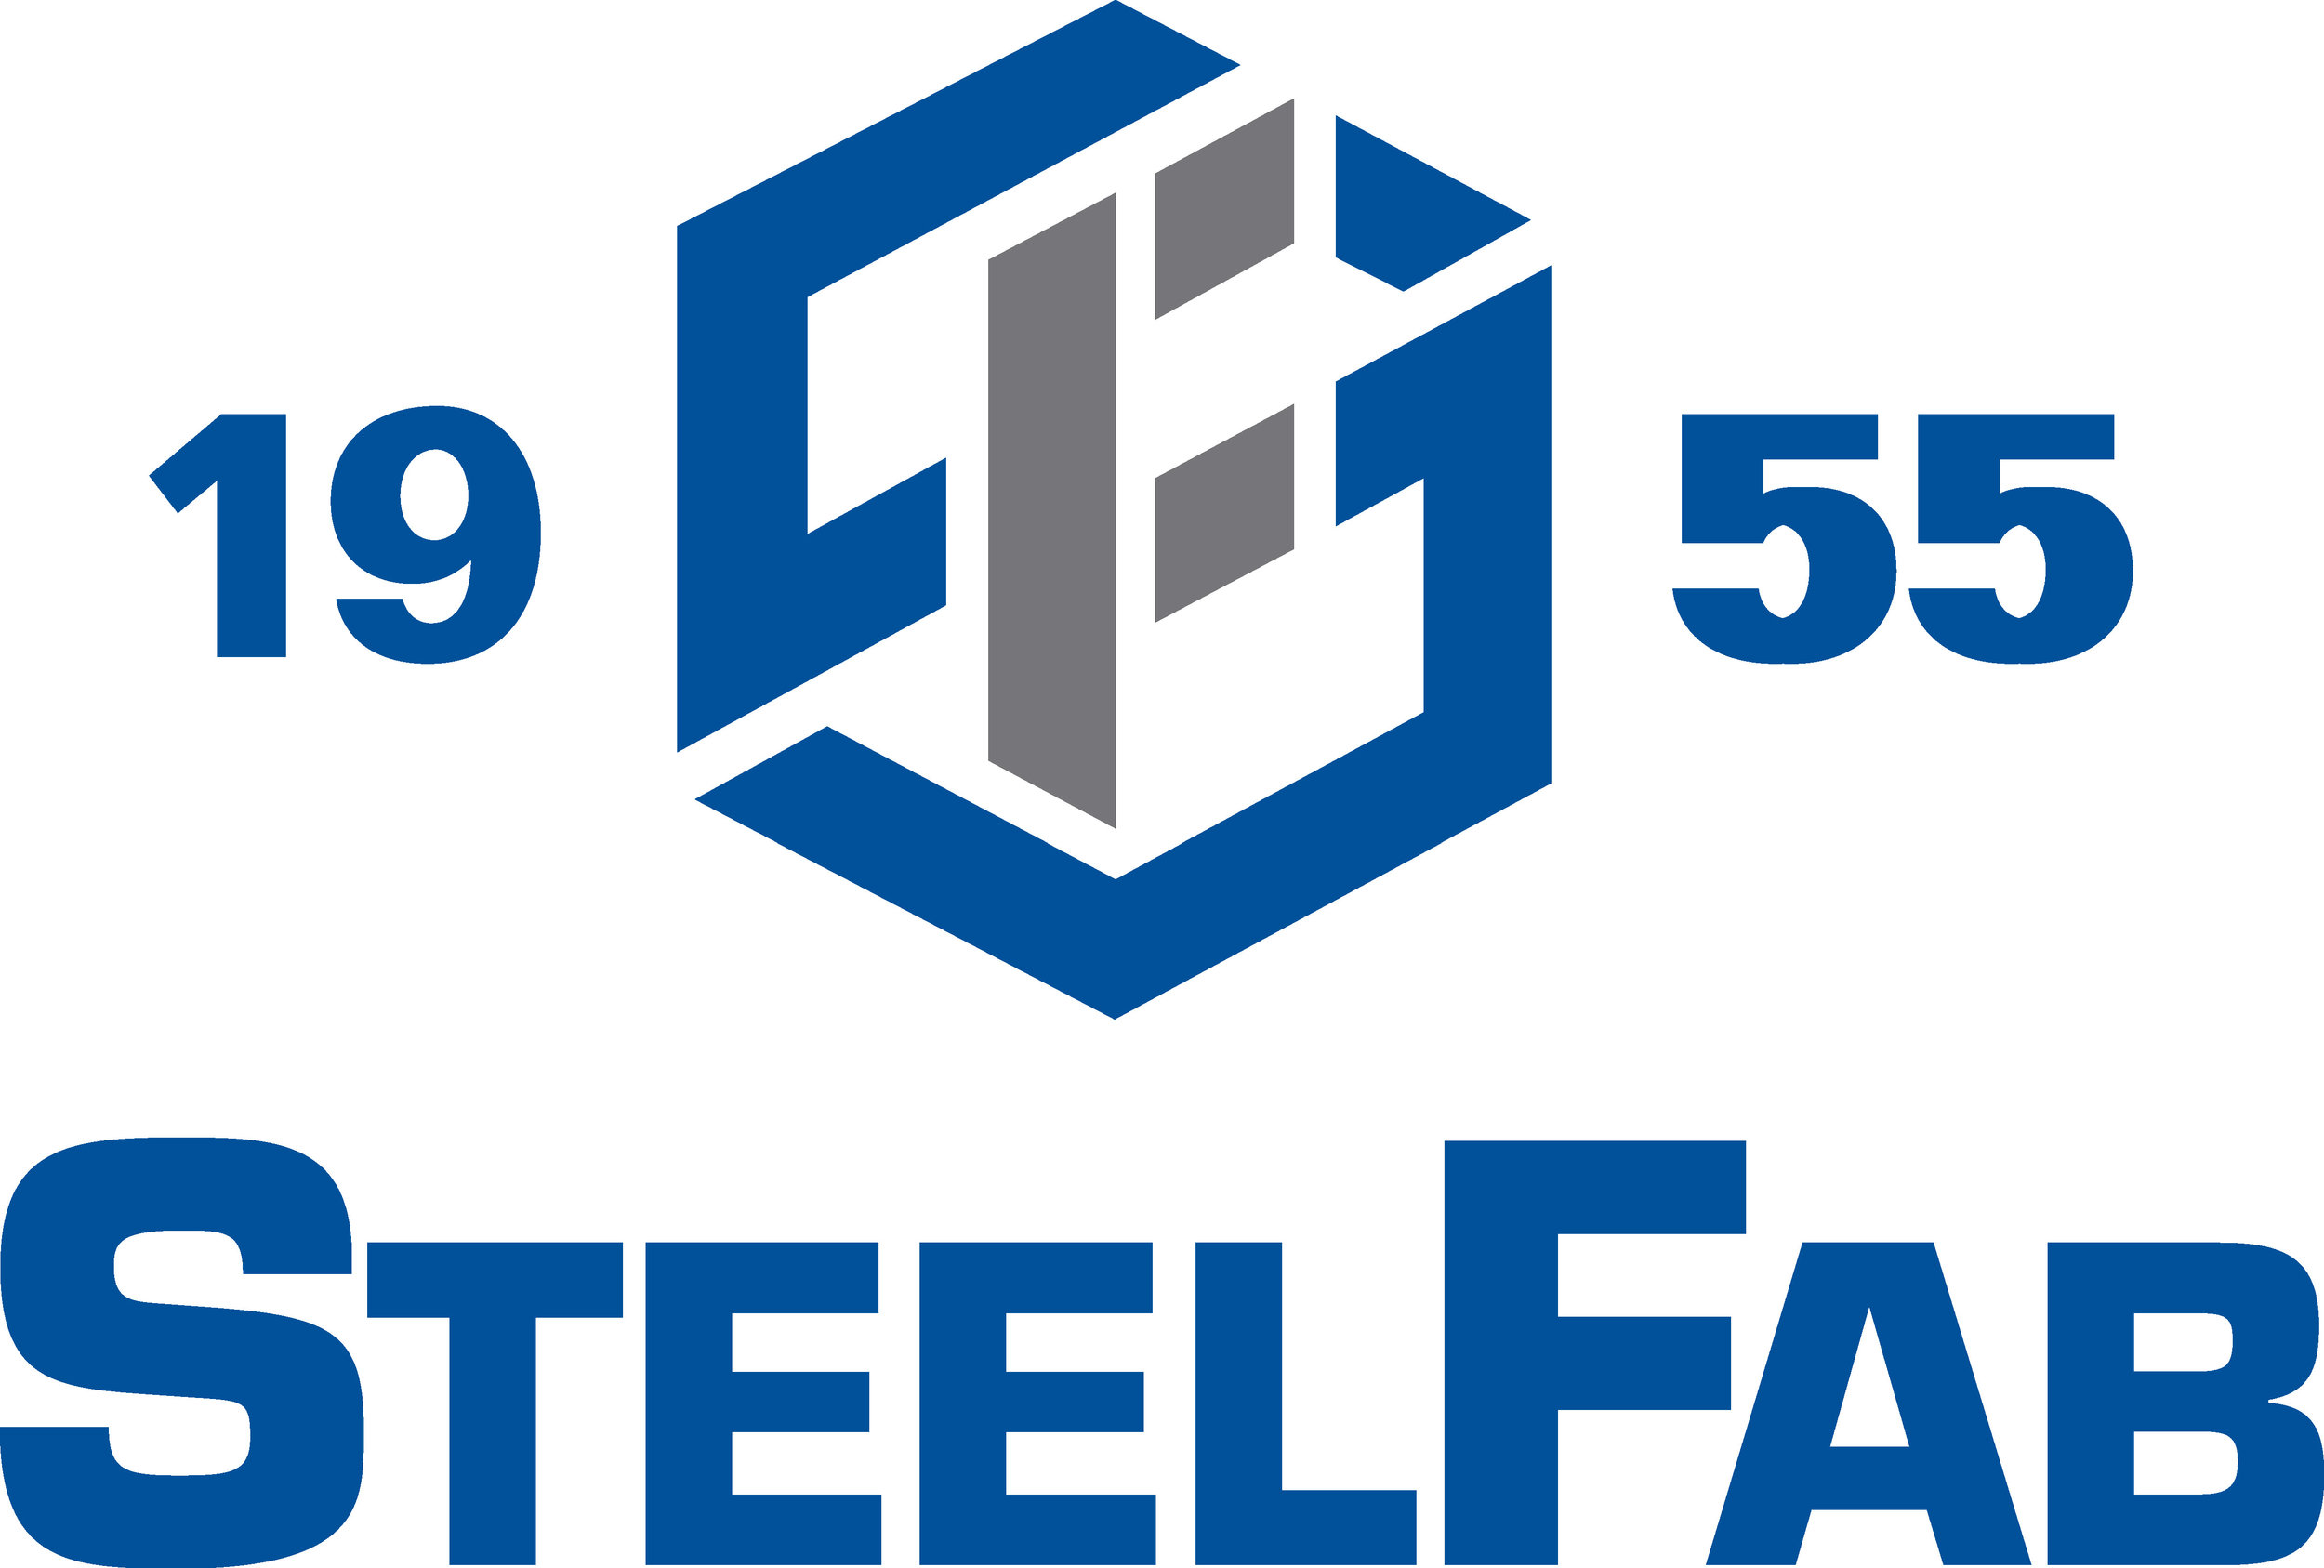 Steel Fab1955_logo.jpg